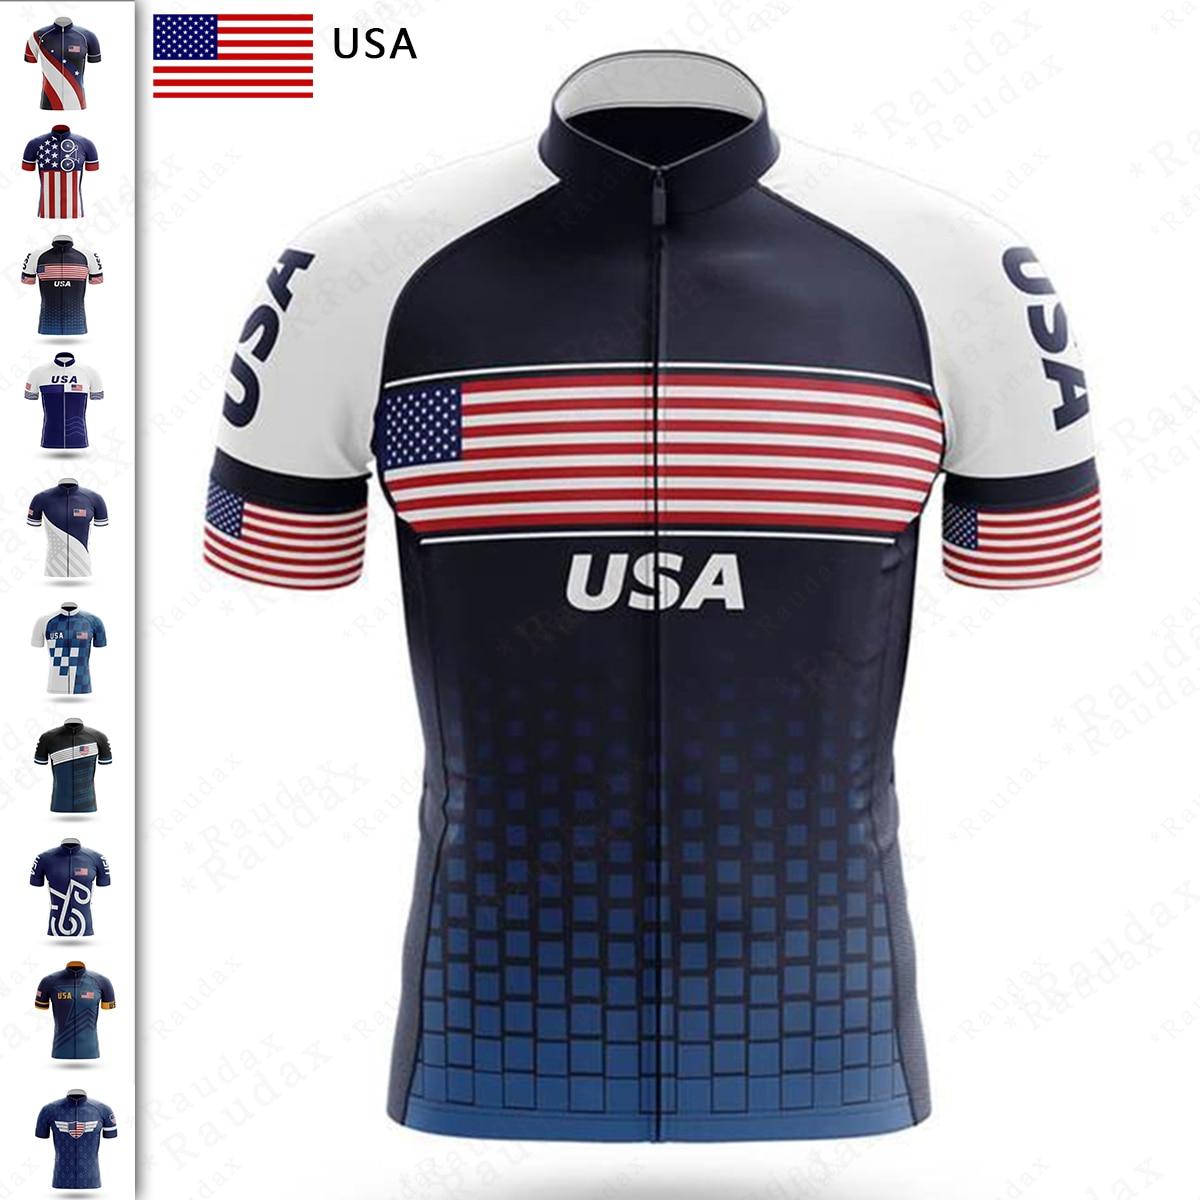 Camiseta De Ciclismo con bandera para hombre, ropa De descenso profesional, deportiva,...